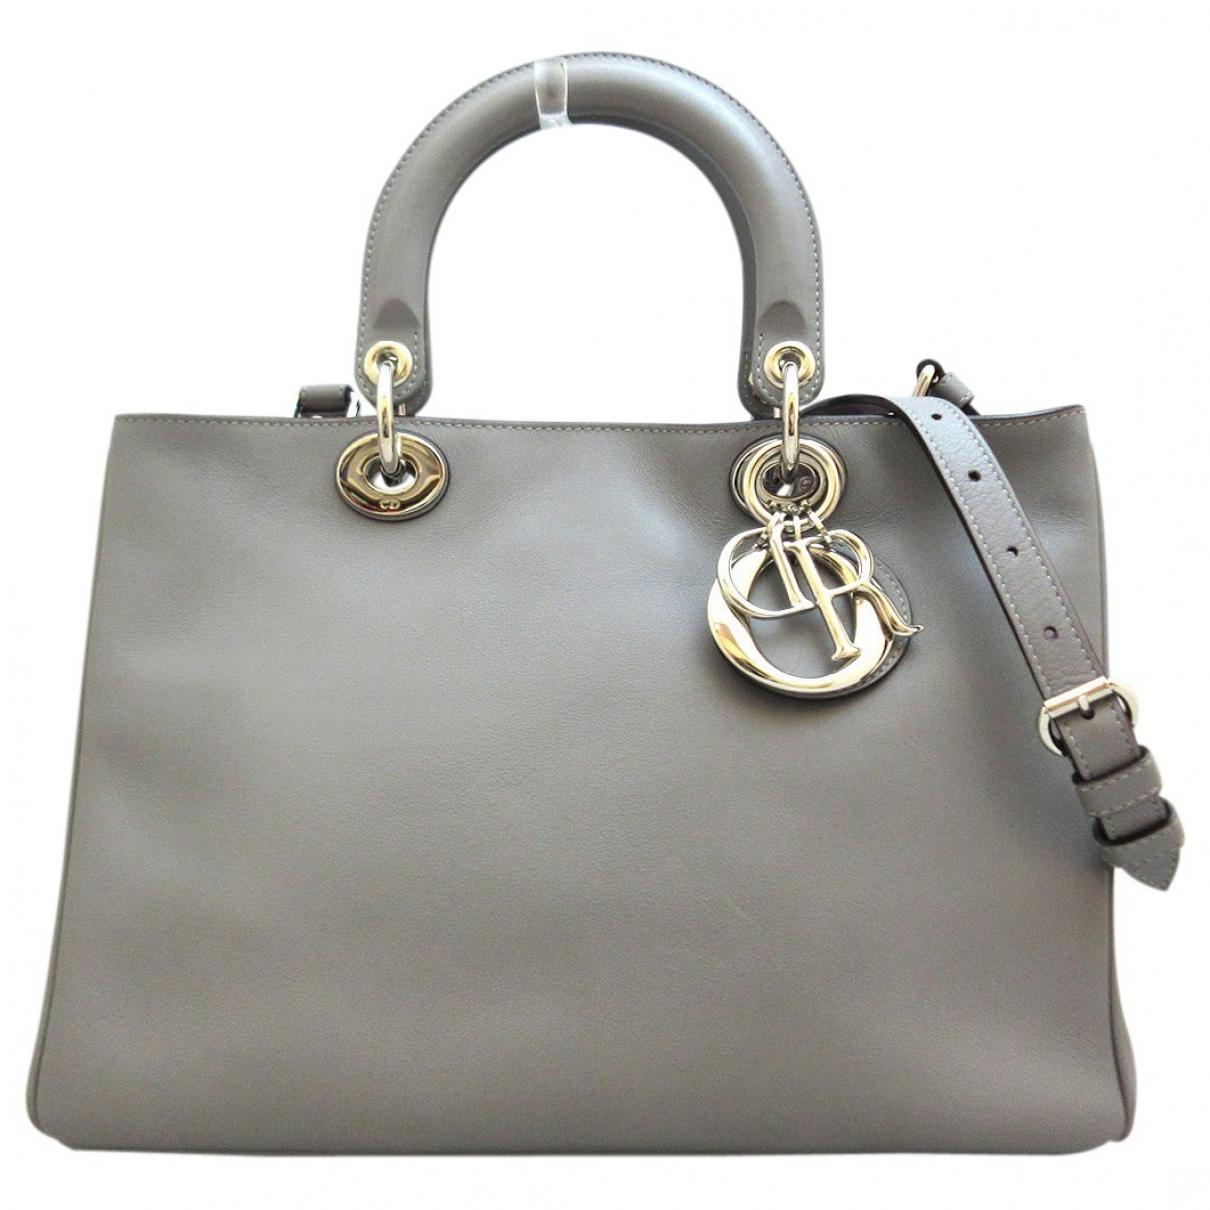 Dior Diorissimo Handtasche in  Grau Leder